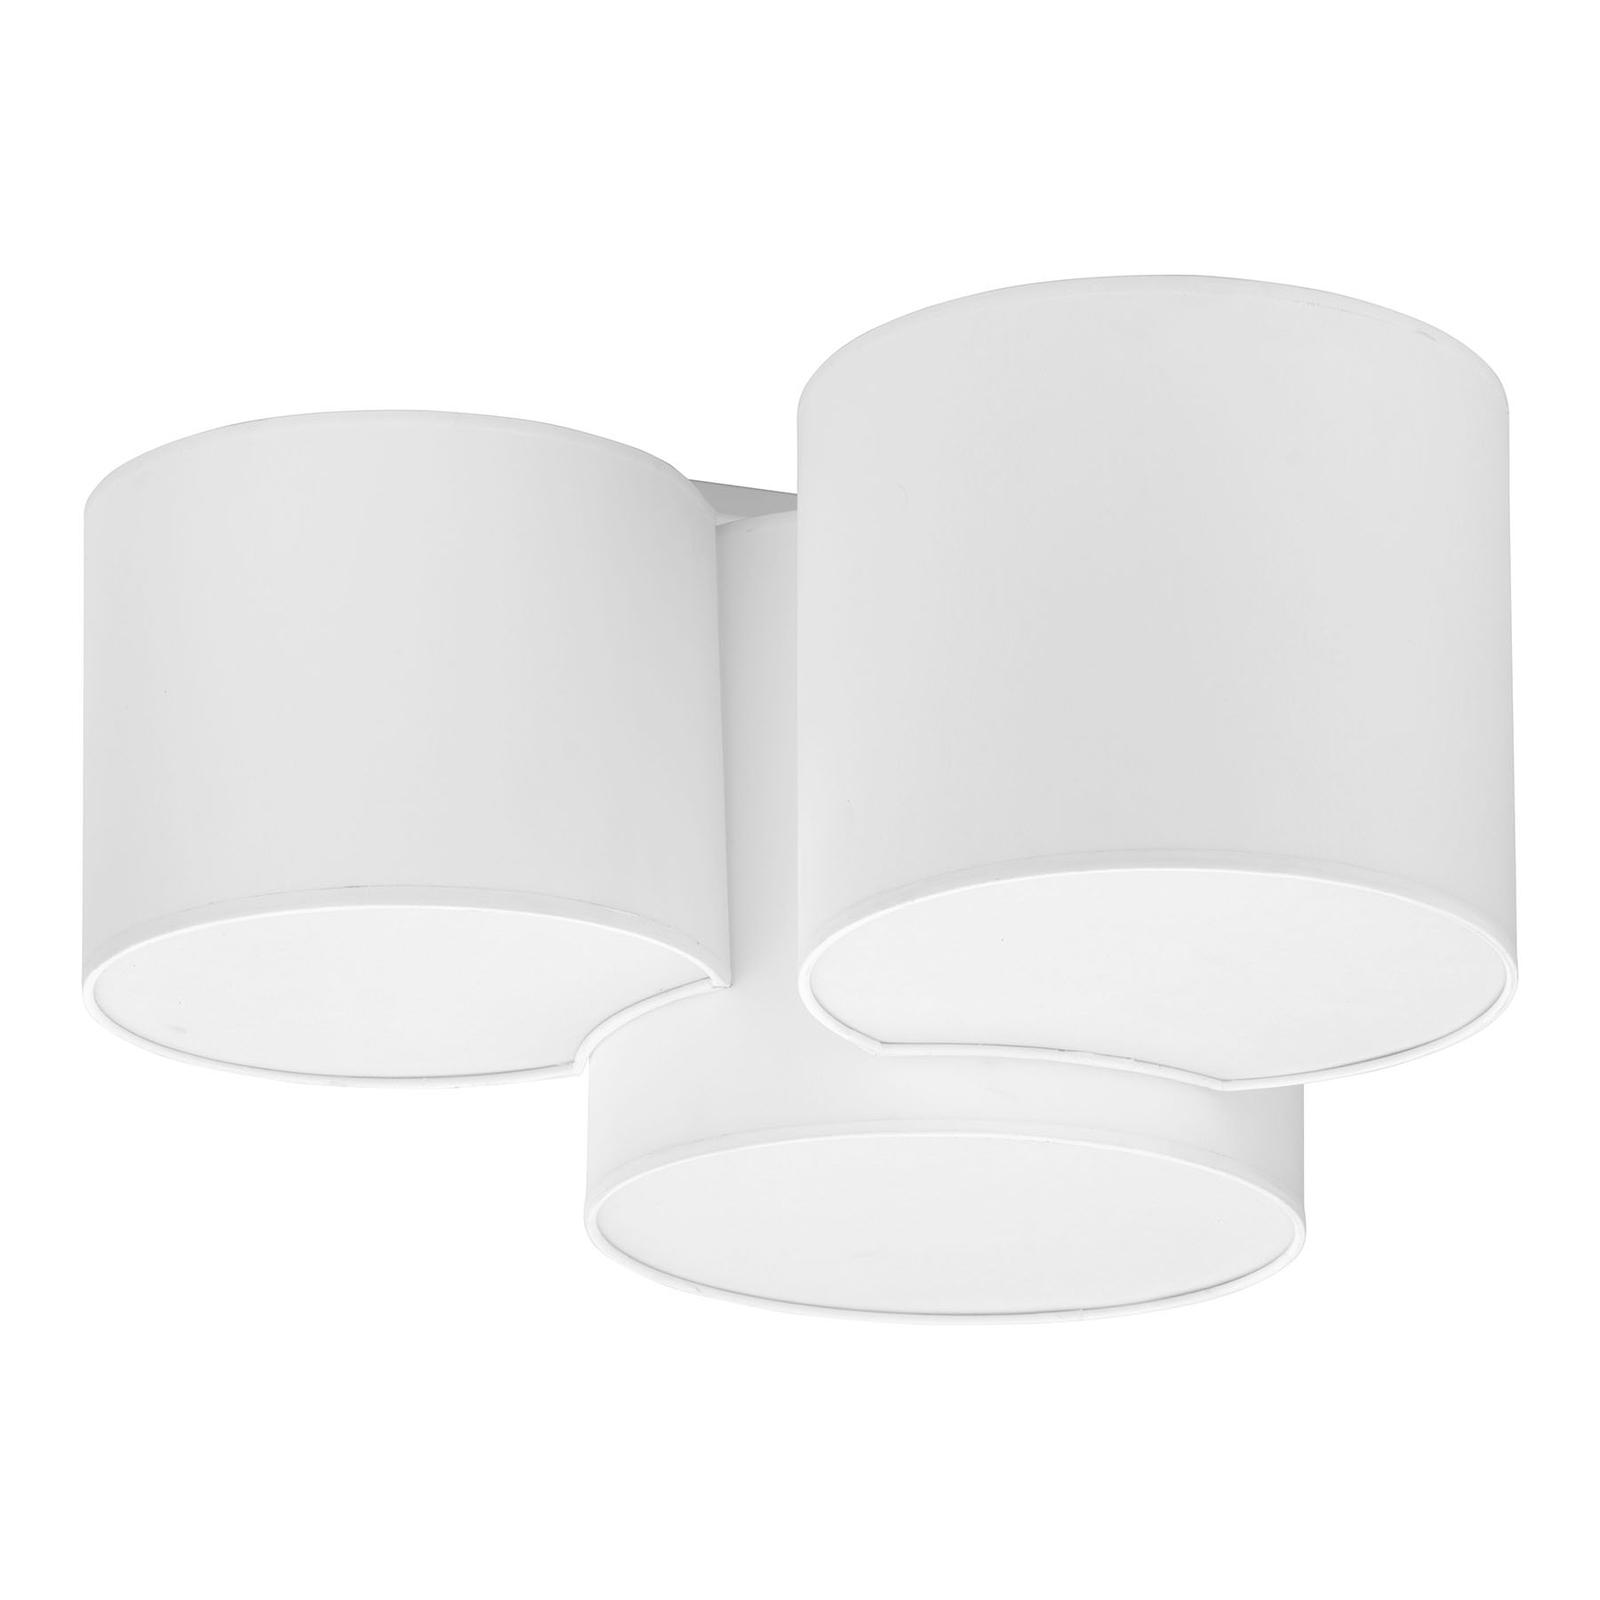 Taklampe Mona, 3 lyskilder, hvit